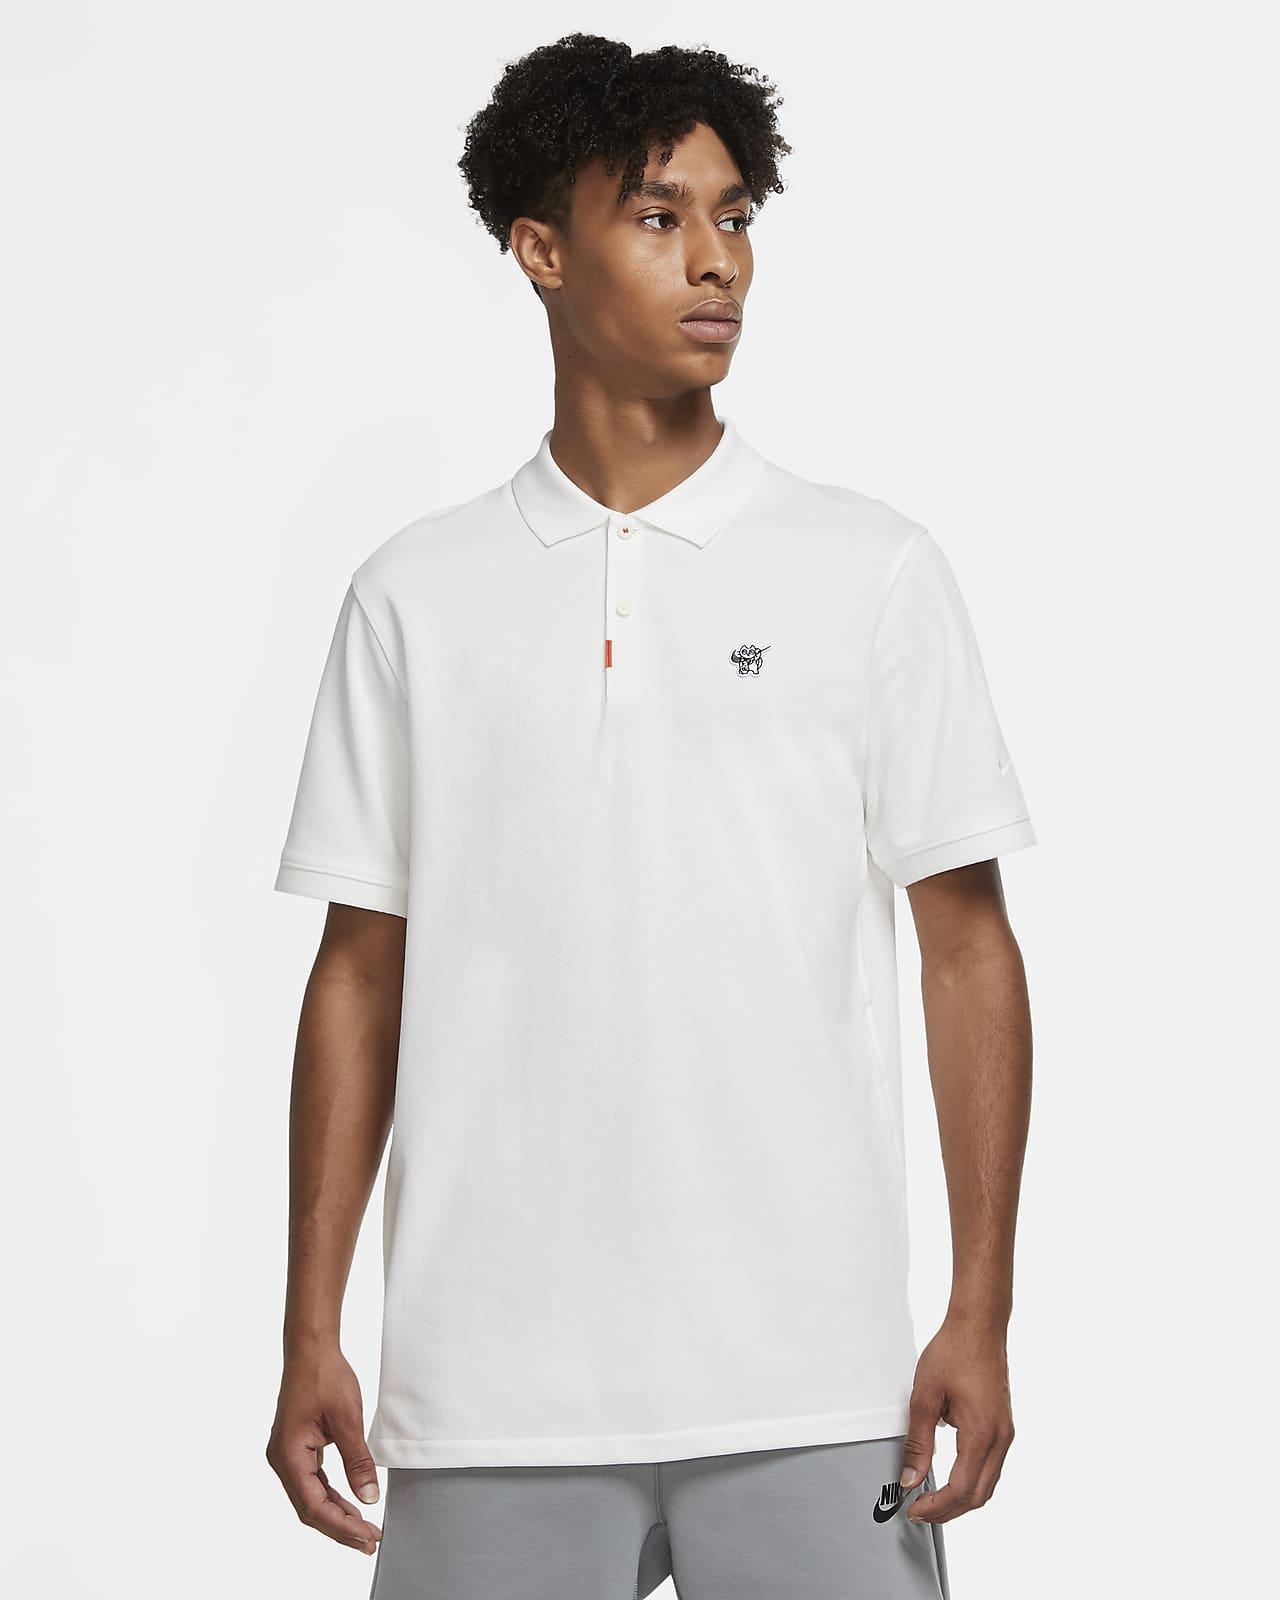 The Nike Polo Naomi Osaka Unisex Slim Fit Polo